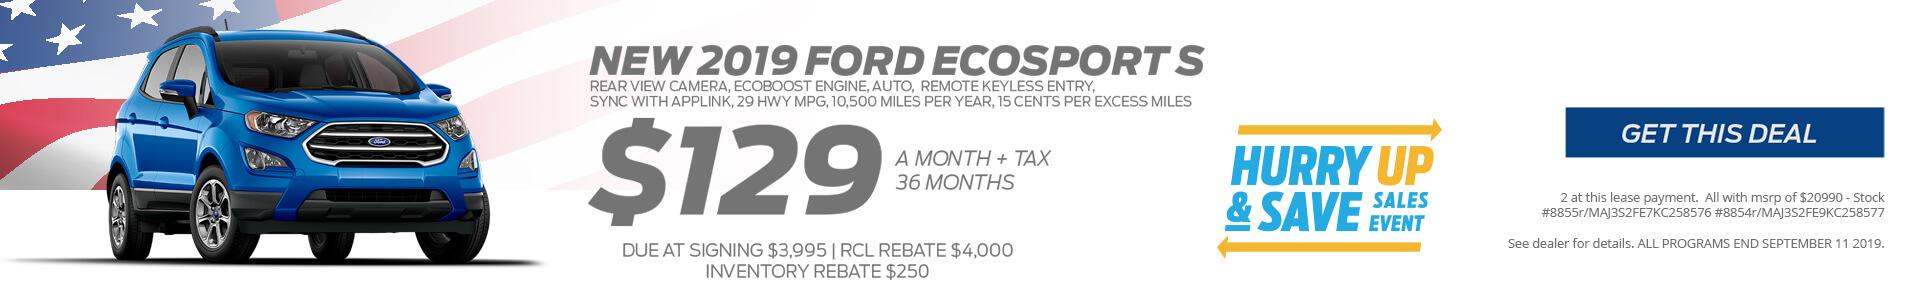 Ecosport $16778